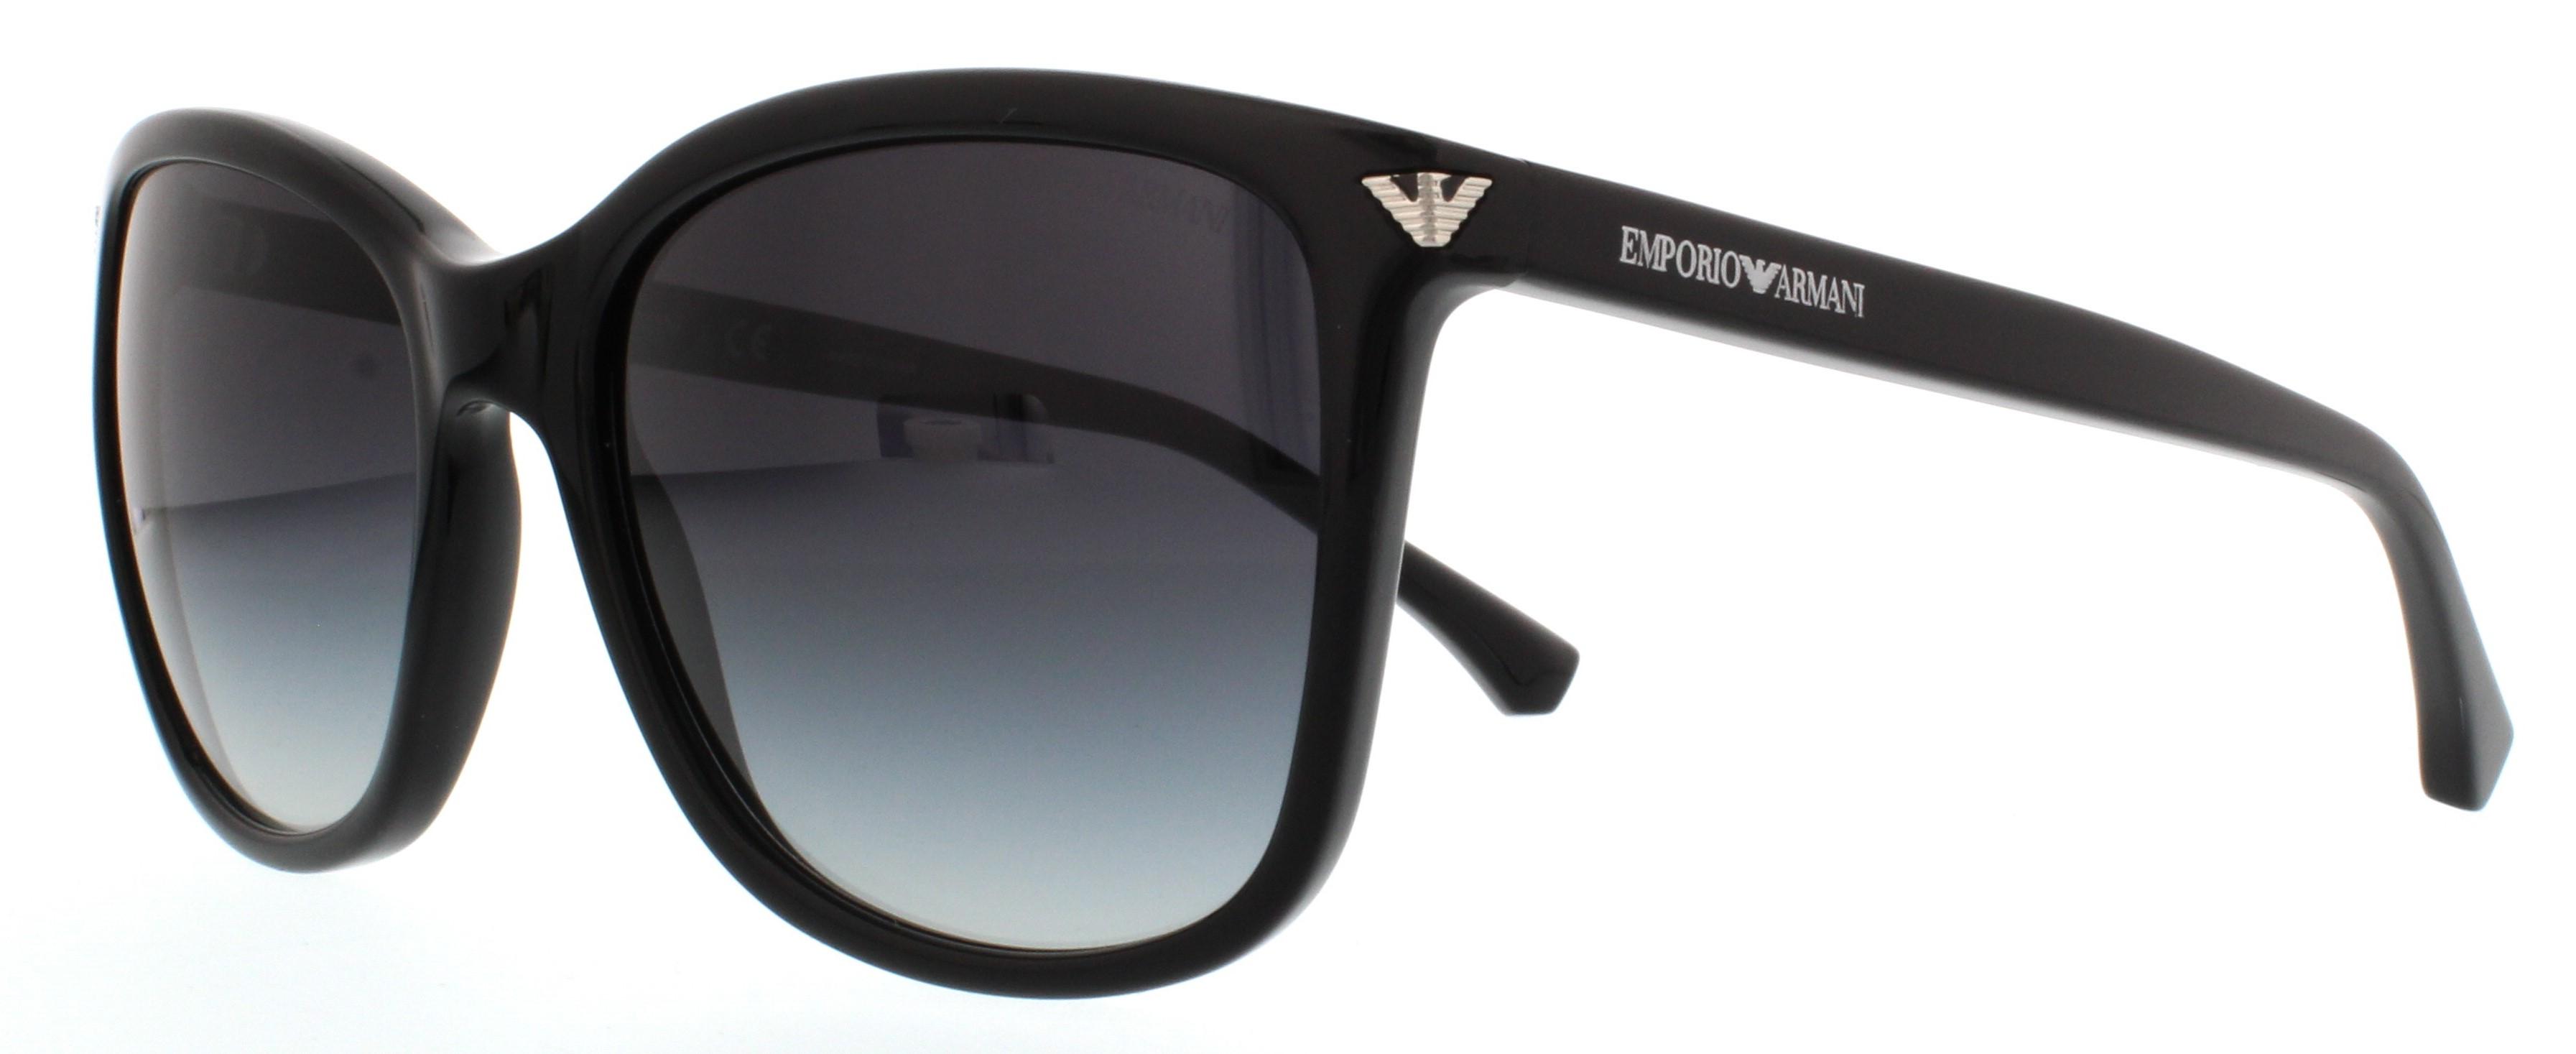 giorgio armani sunglasses womens